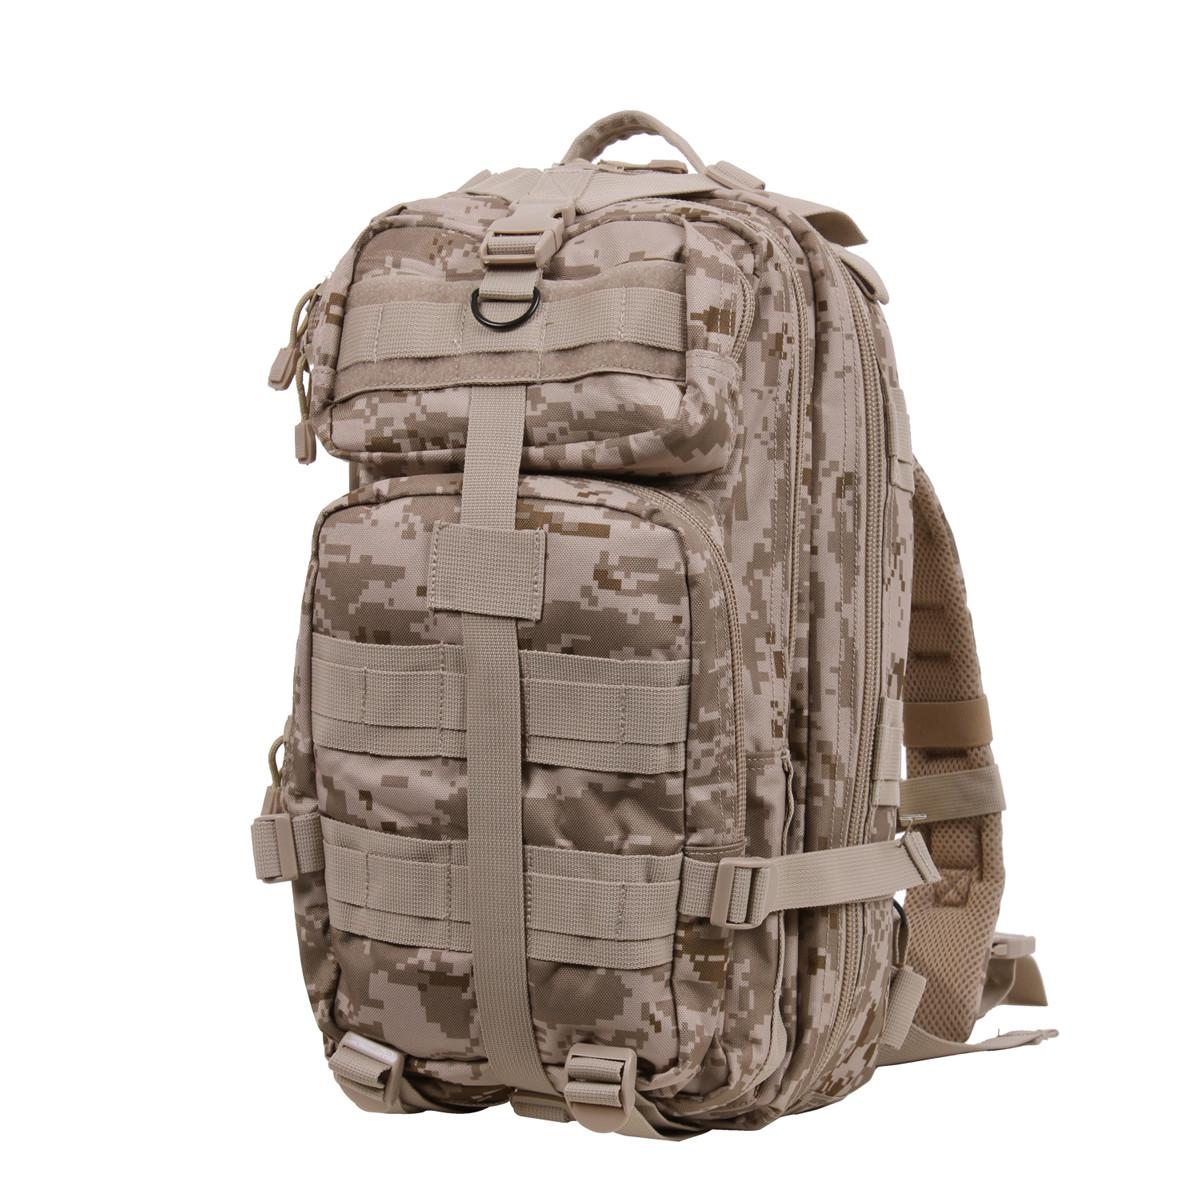 631385c96e Kids Marines Desert Digital Camo Backpack - Fatigues Army Navy